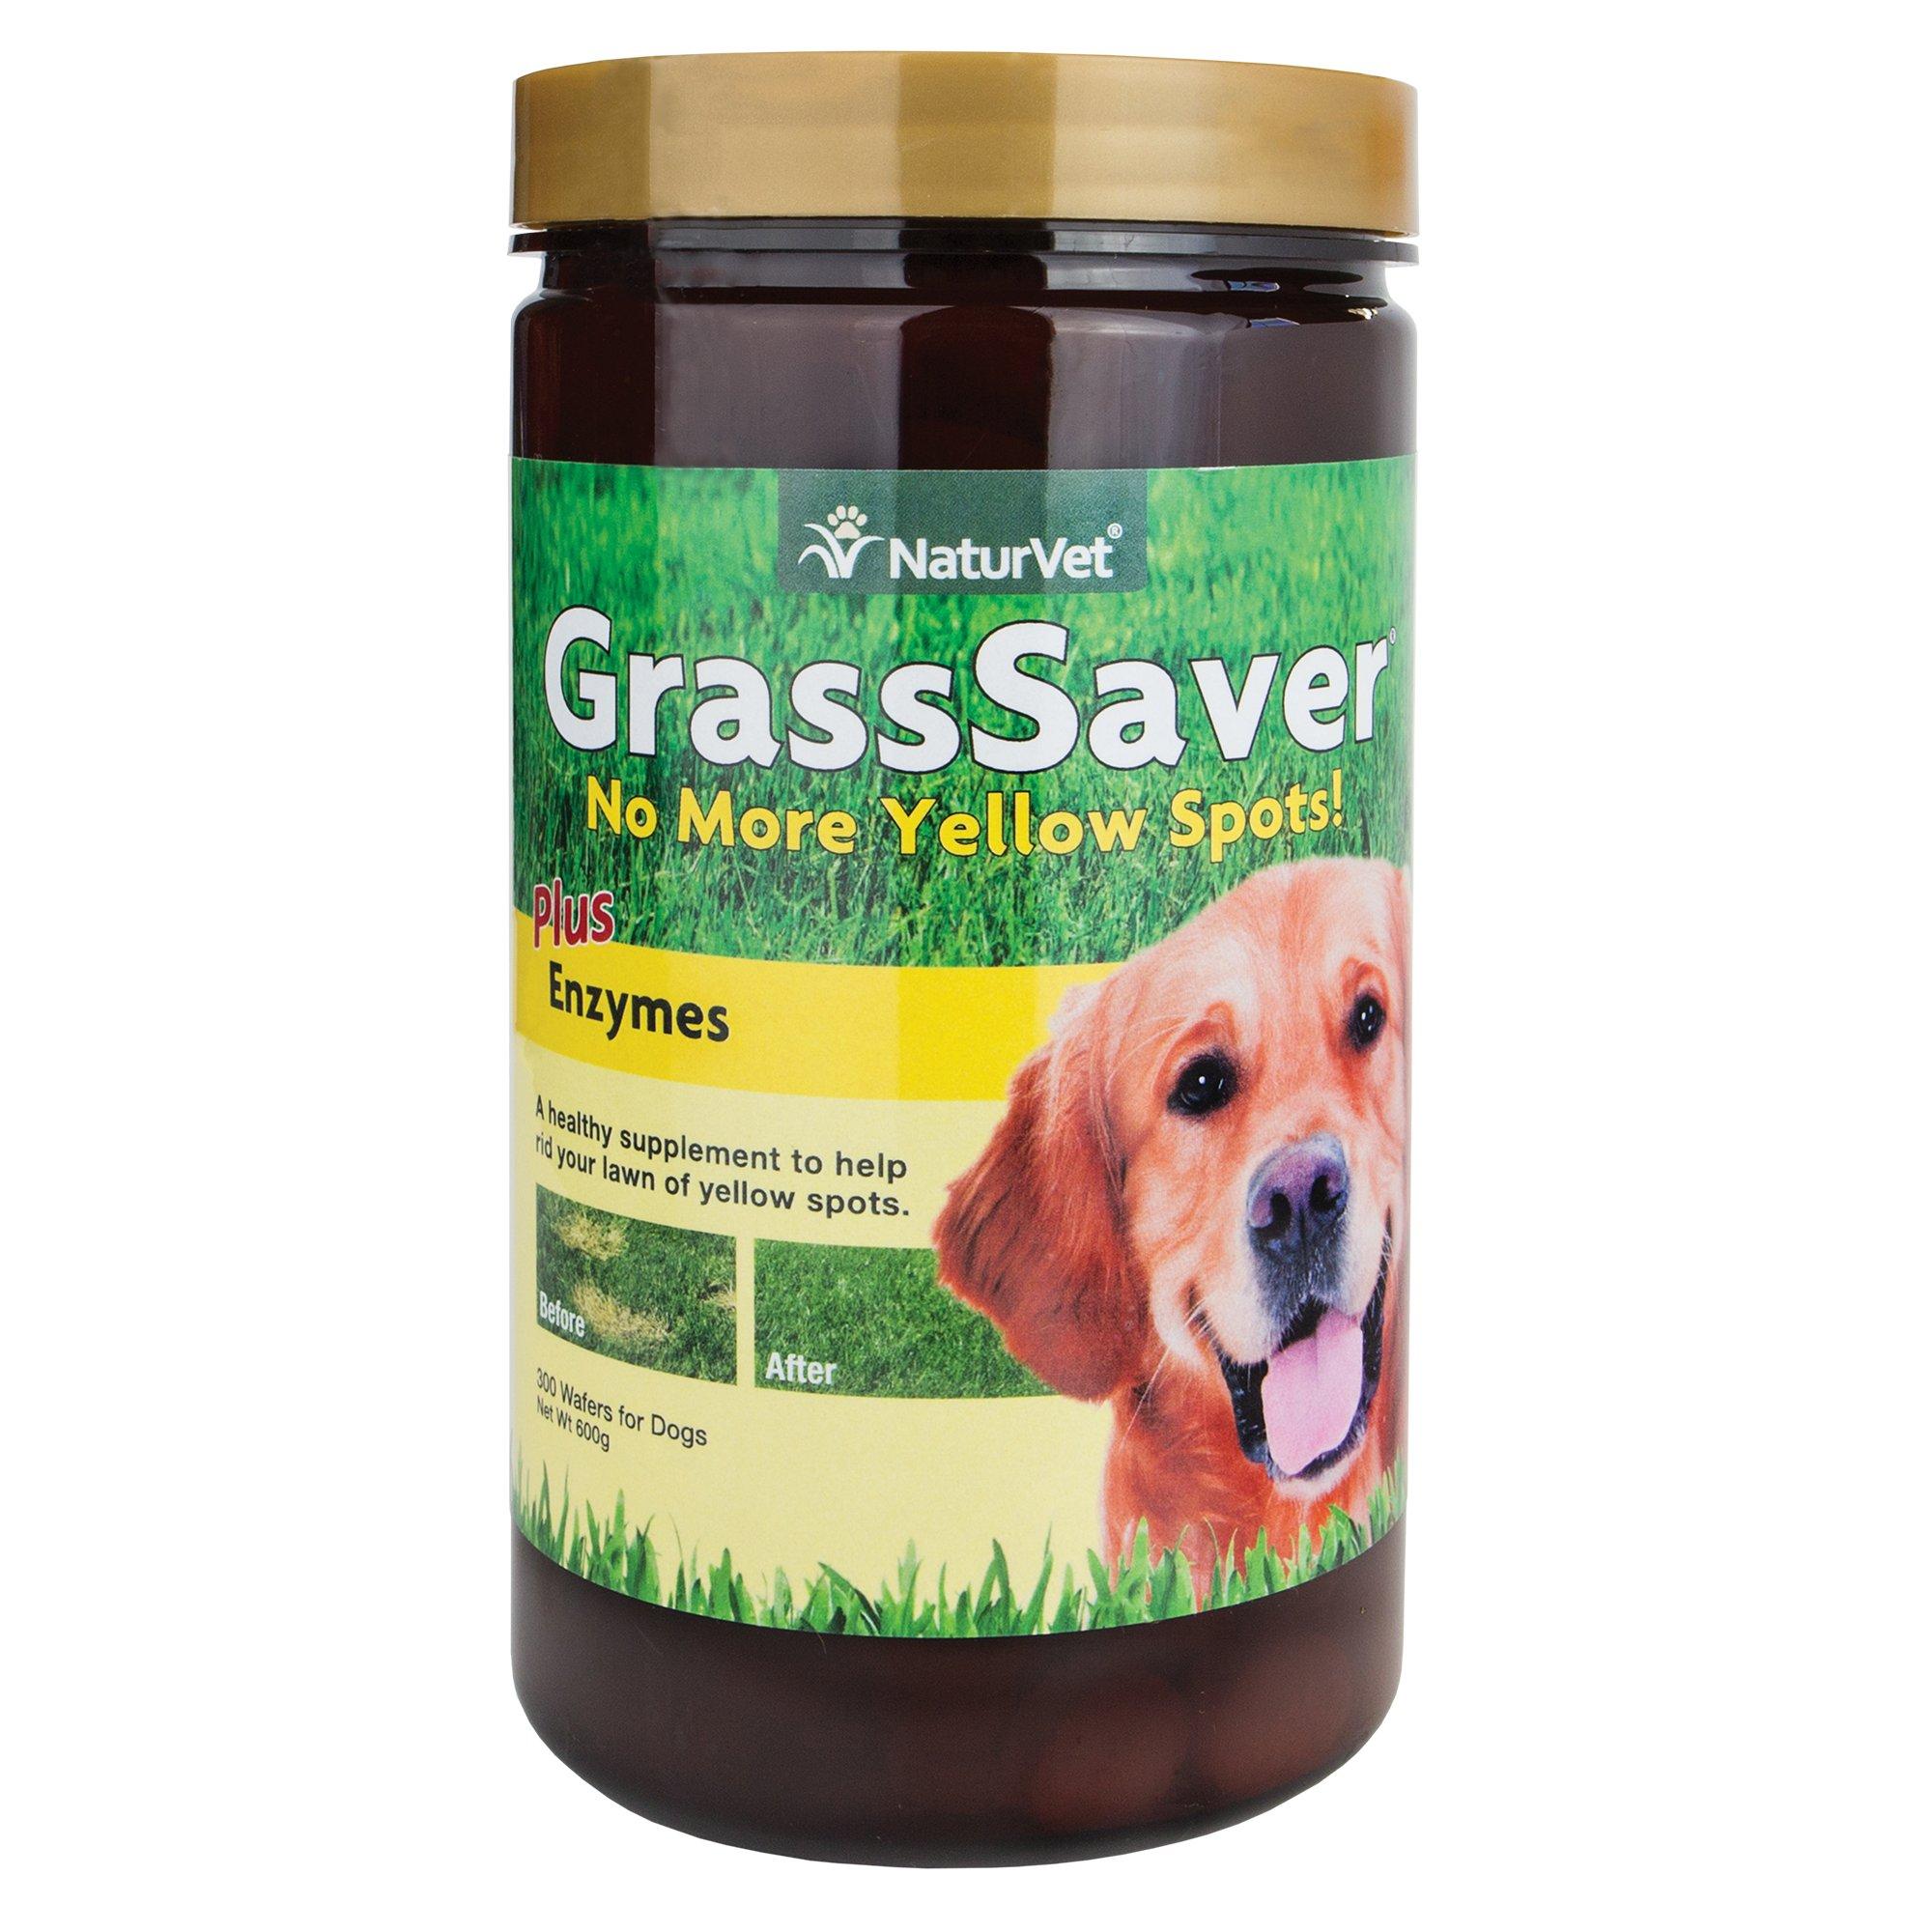 NaturVet GrassSaver Wafers for Dogs